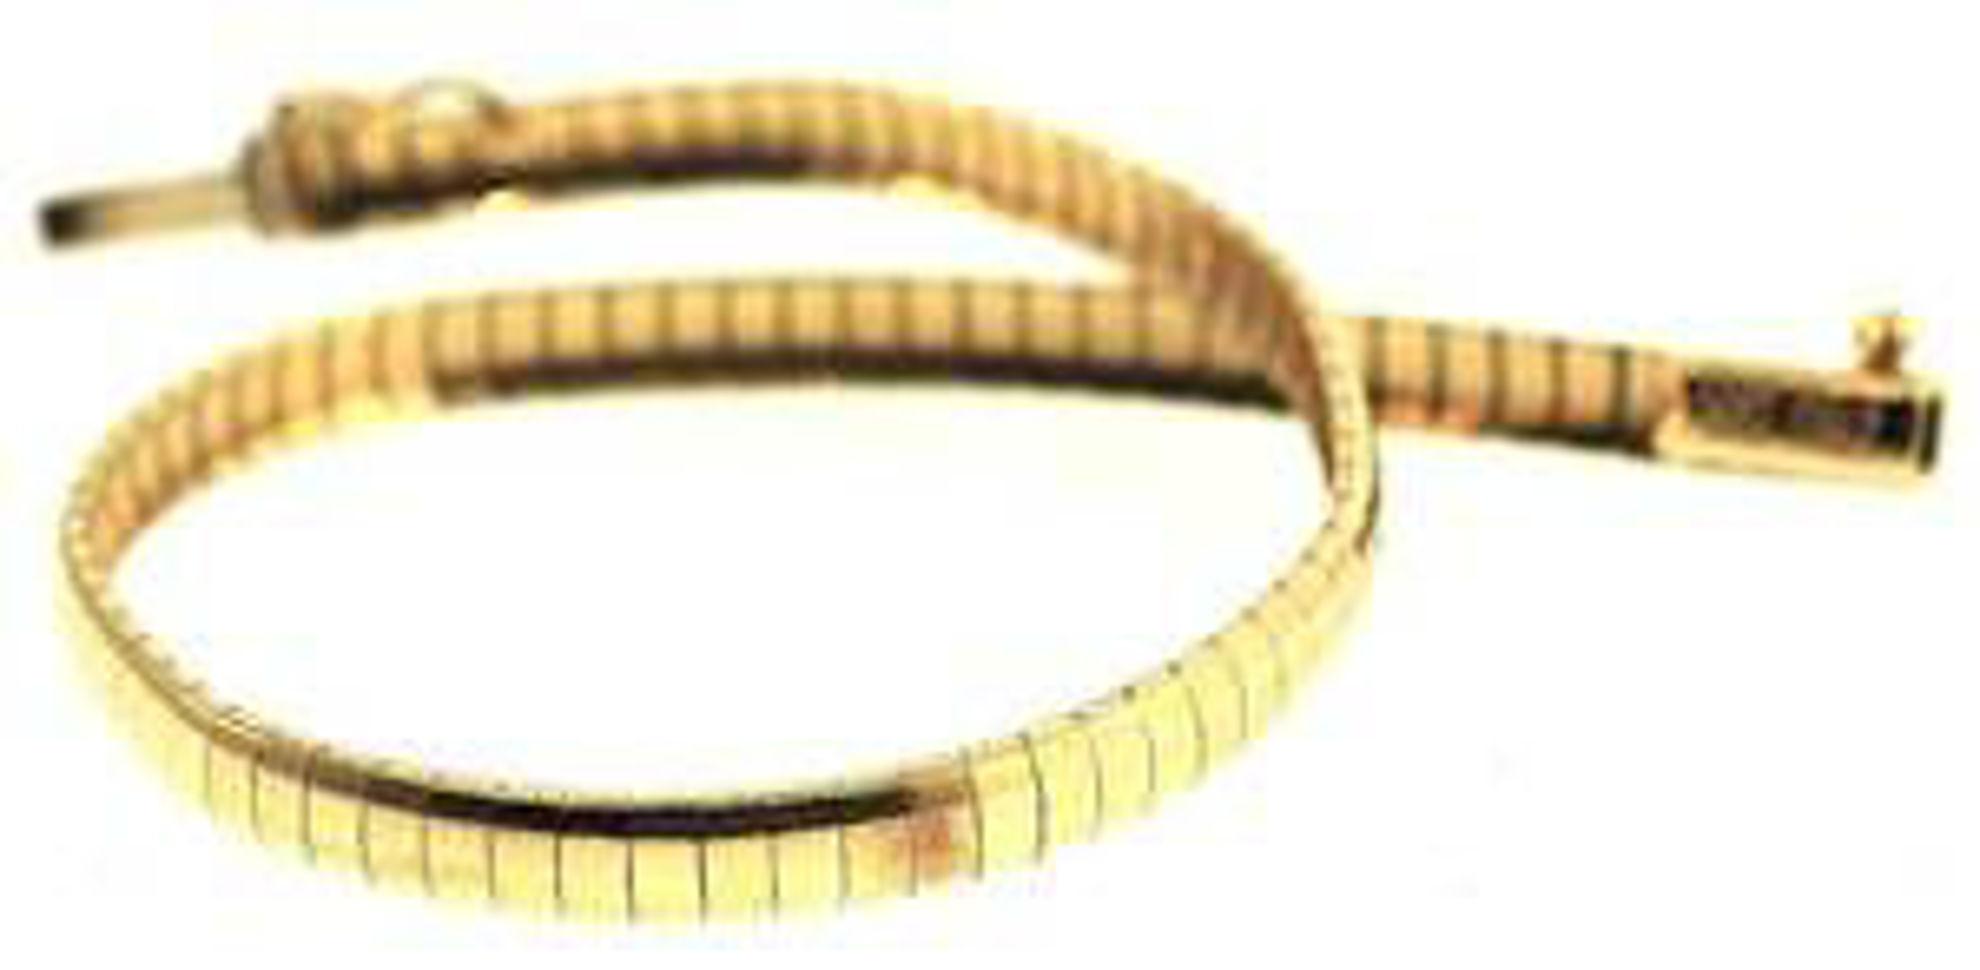 Picture of Bracelets 14kt-5.2 DWT, 8.1 Grams